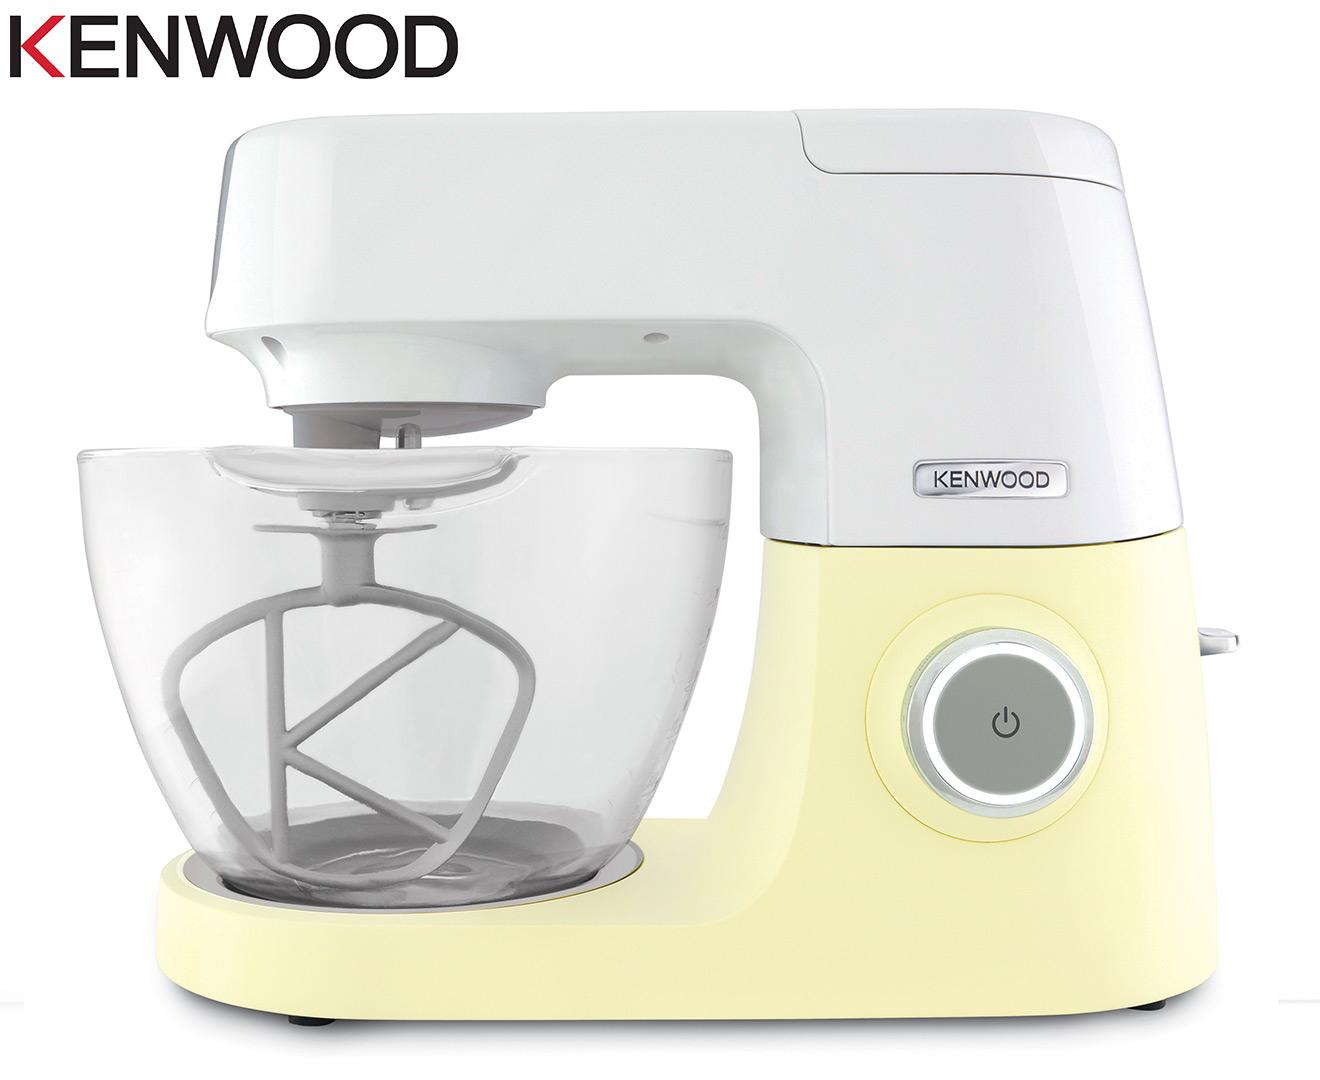 kenwood chef sense mixer zested yellow ebay. Black Bedroom Furniture Sets. Home Design Ideas